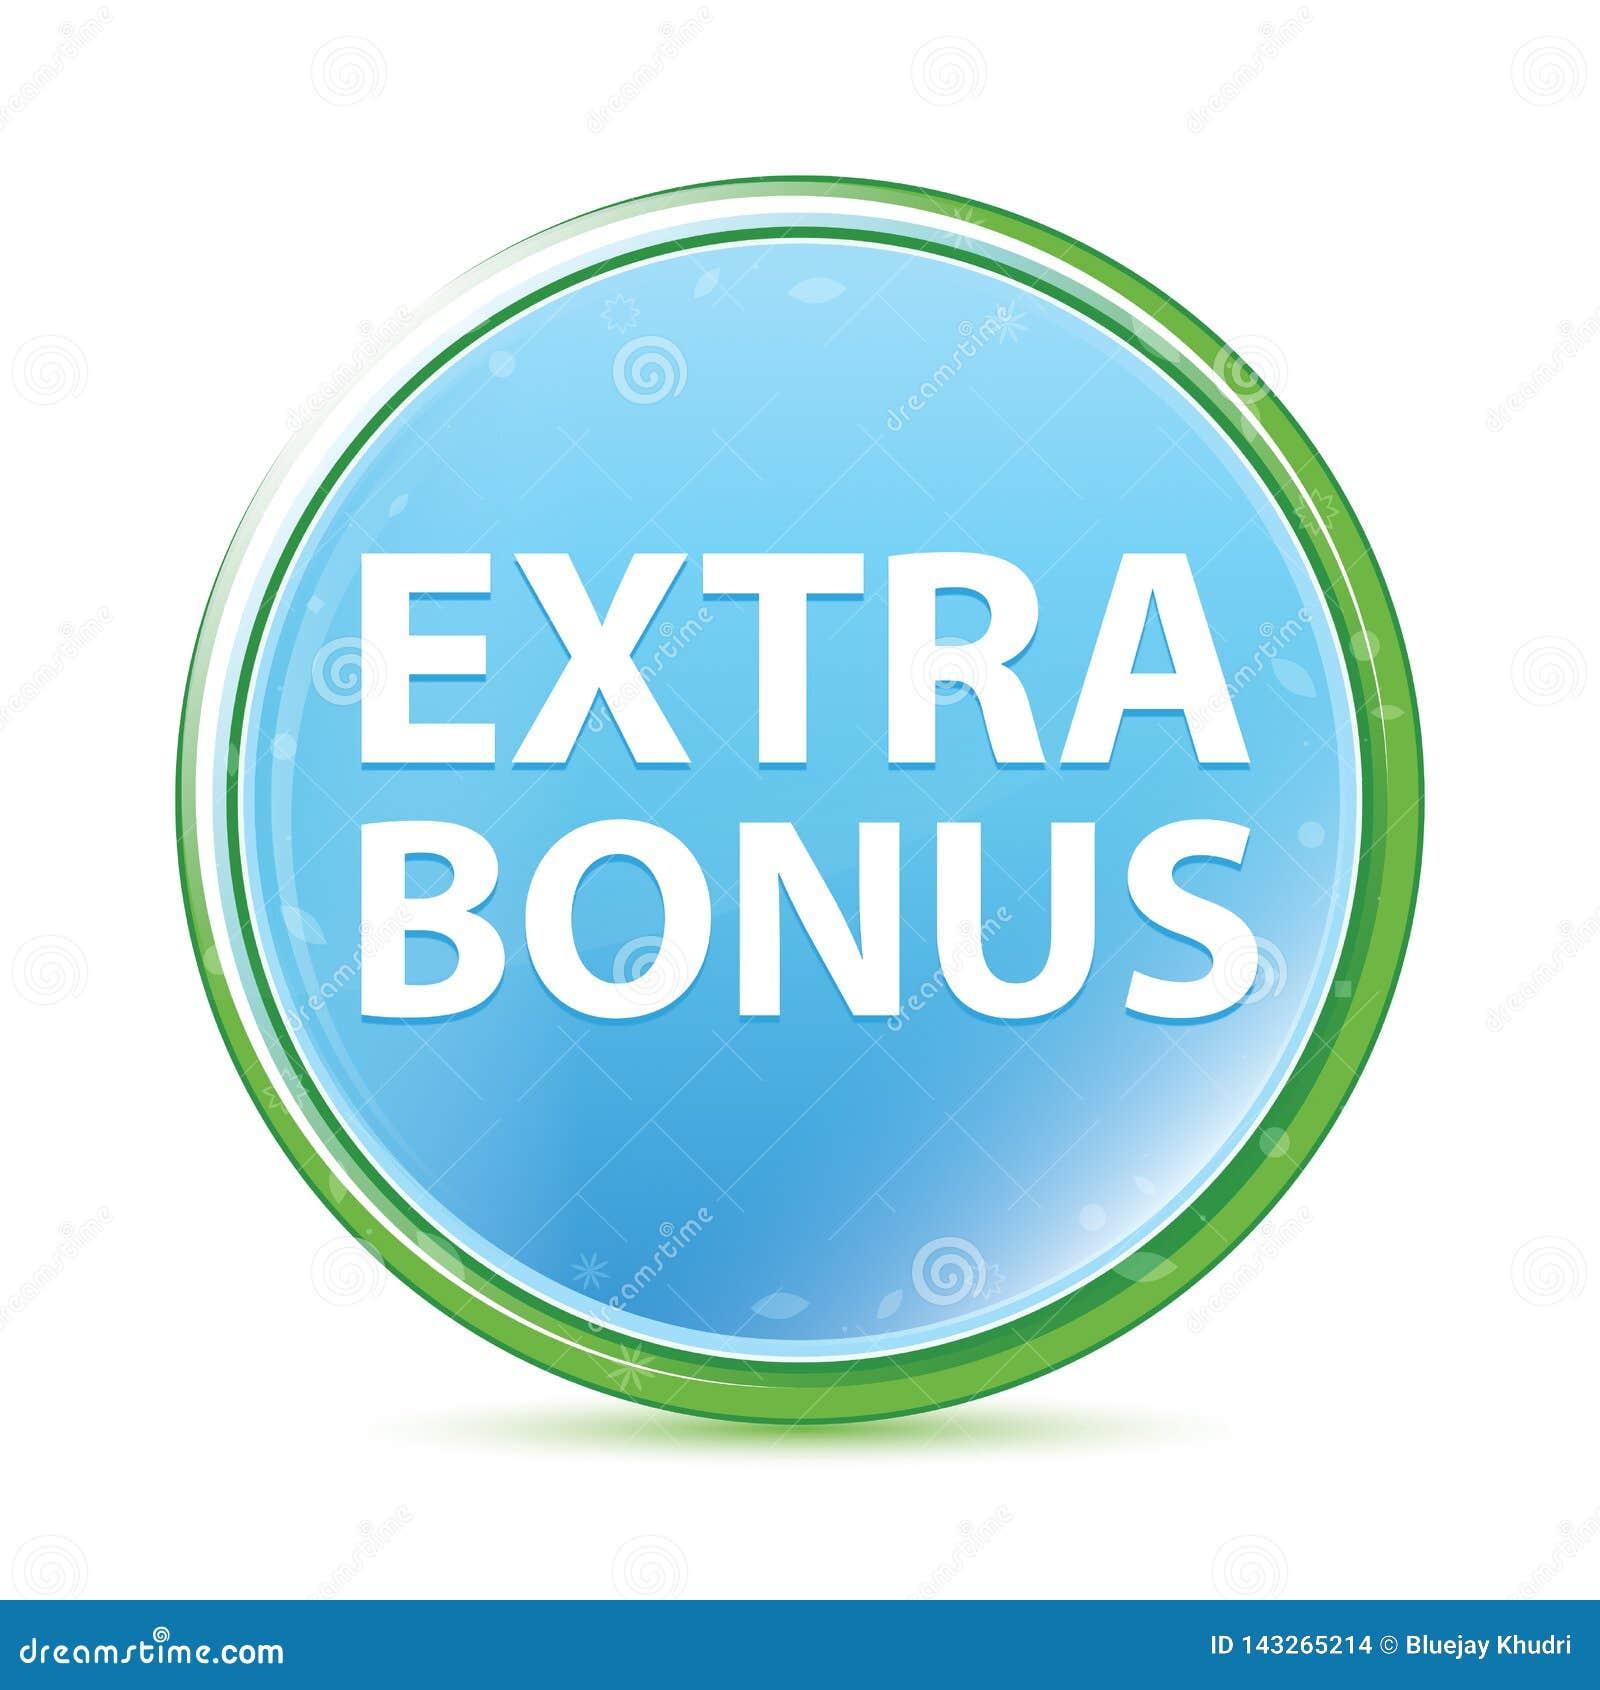 Extra Bonus natural aqua cyan blue round button